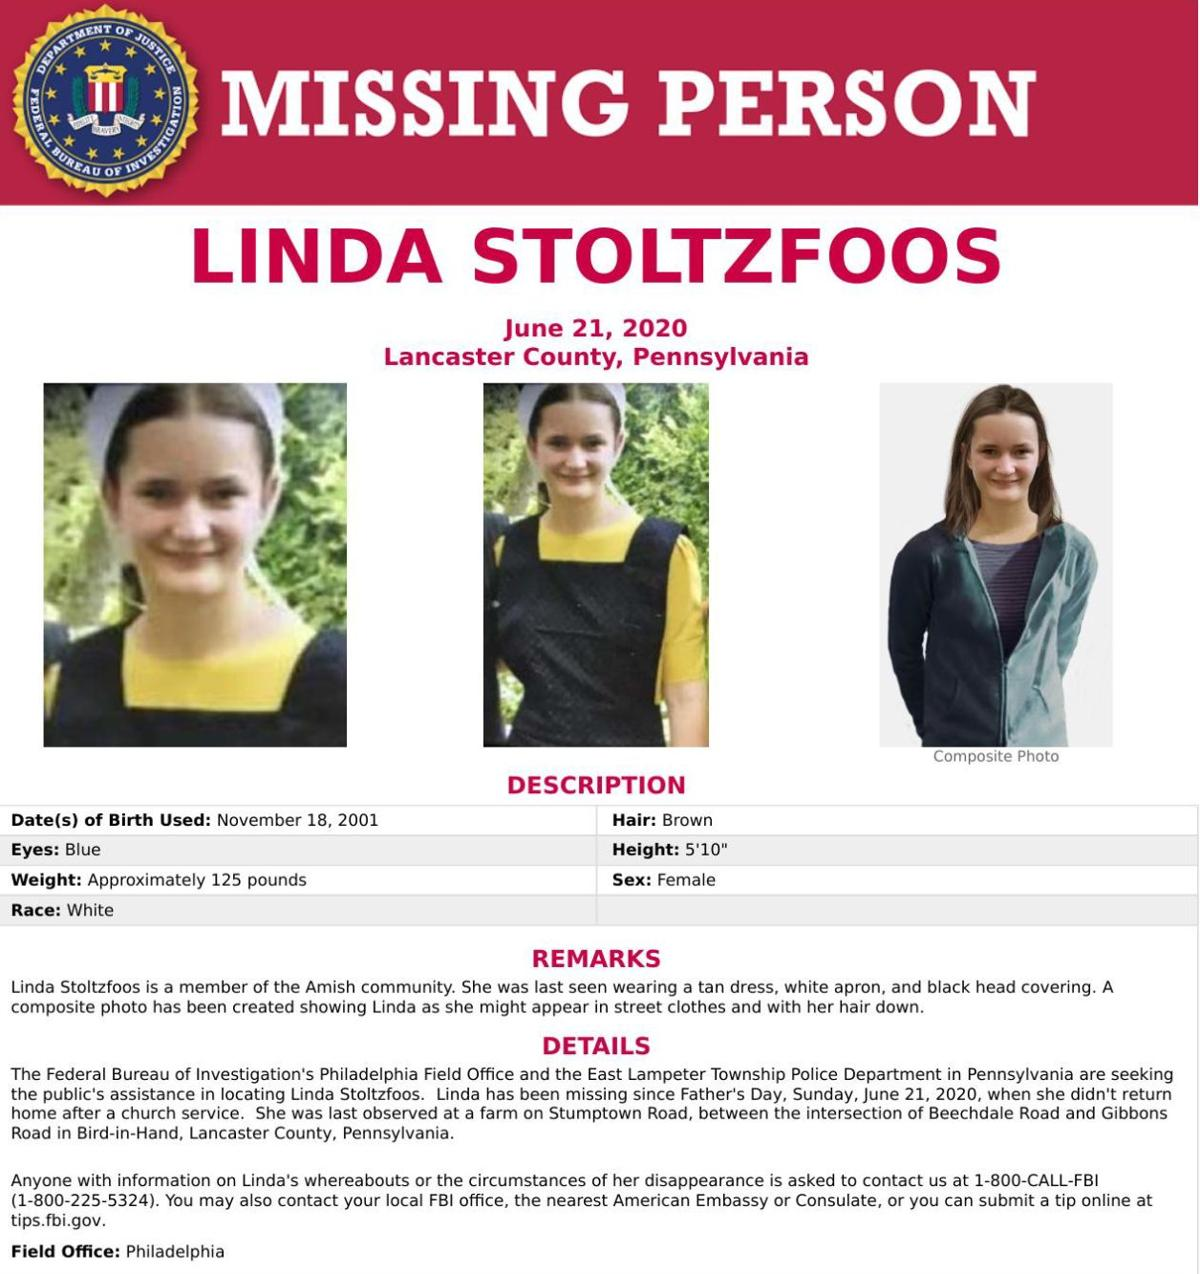 Linda Stoltzfoos